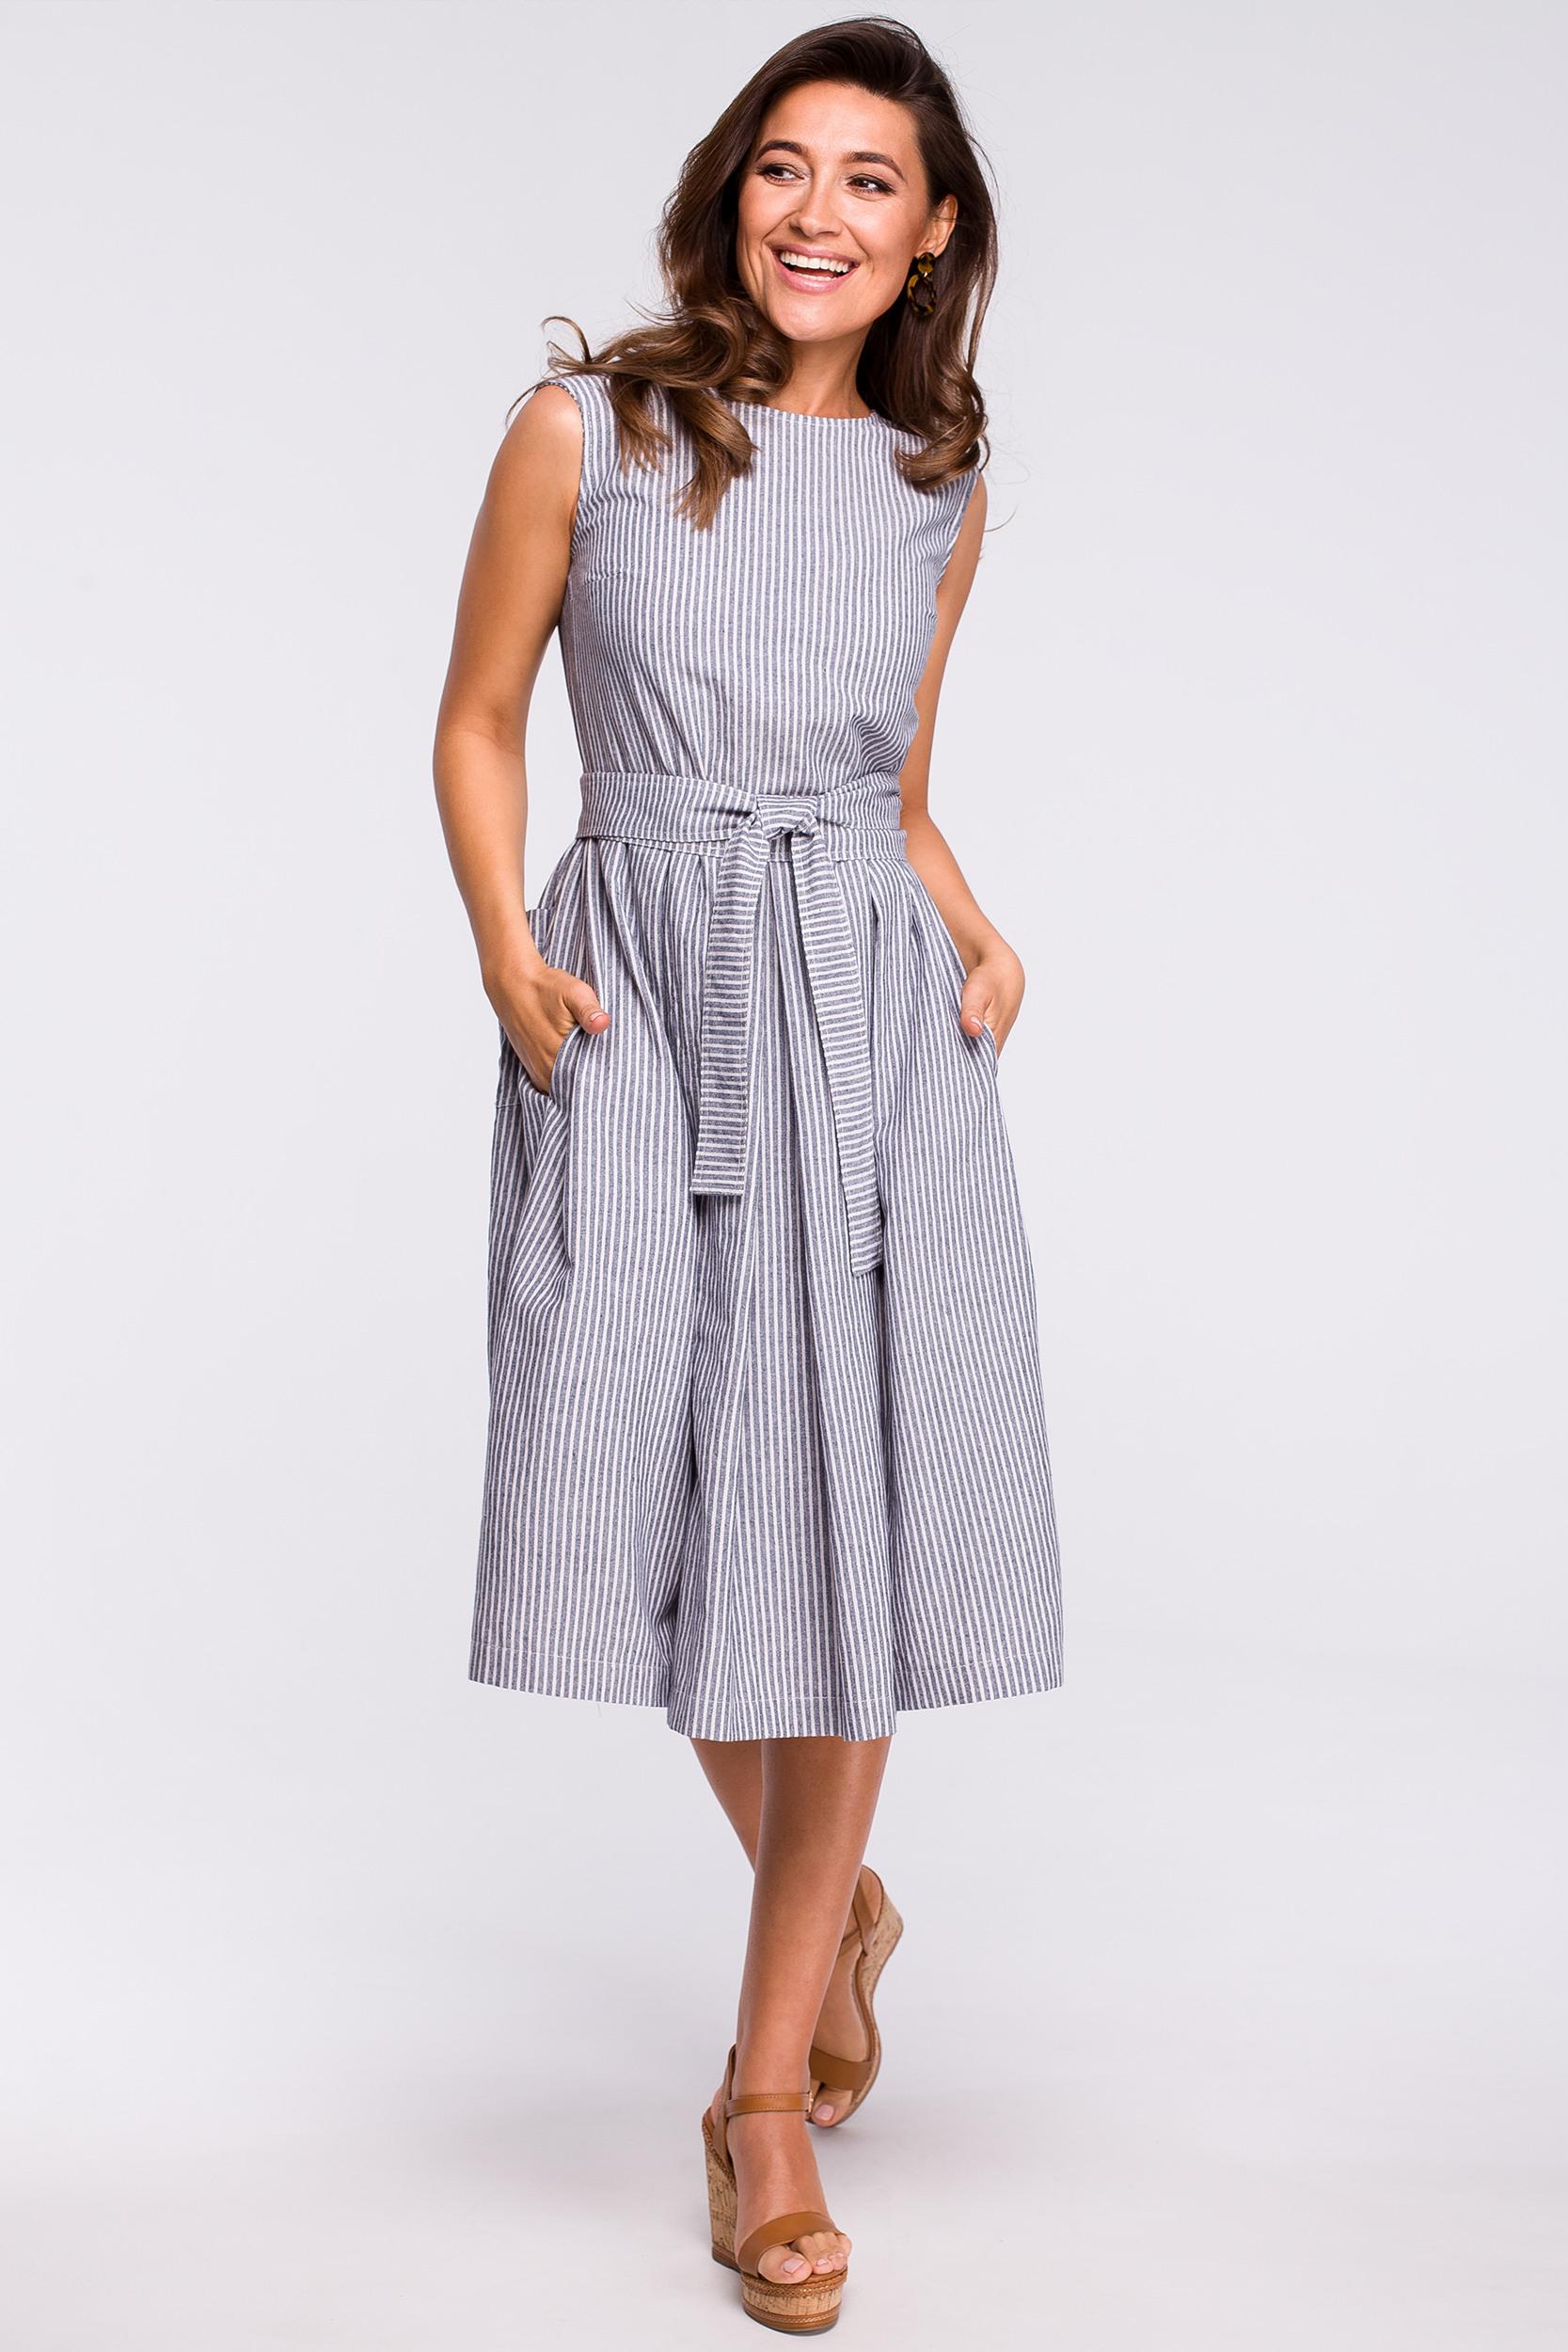 S162 Geripptes Kleid In Kellerfalten  Stylovede